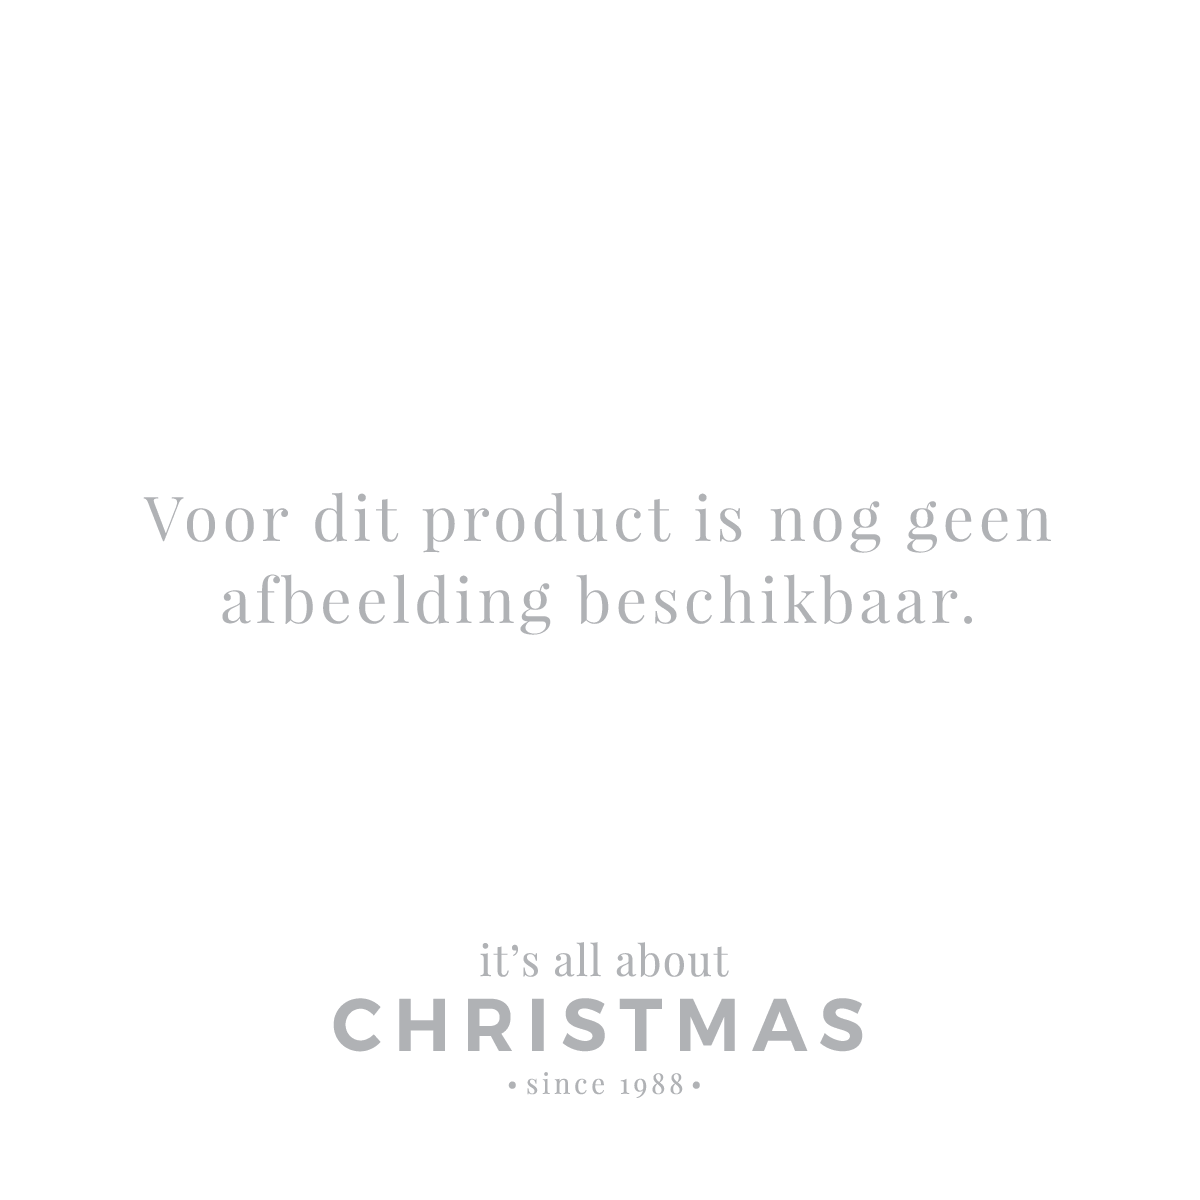 Christbaumkugeln Champagner Glas.Christbaumkugel Champagner Mit Kringel It S All About Christmas